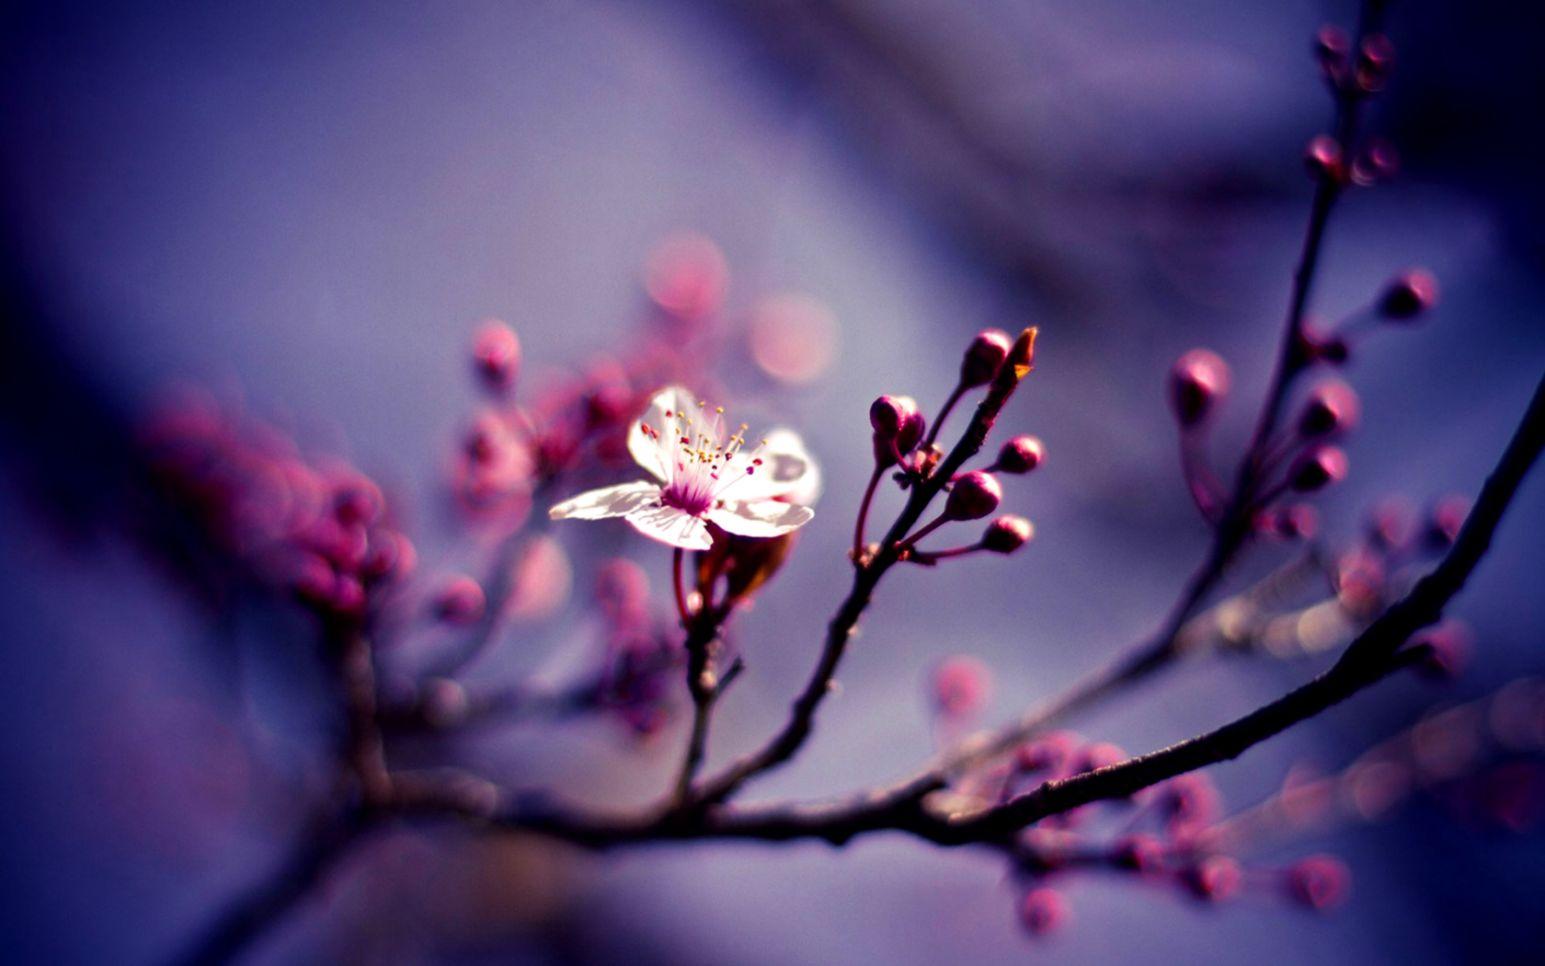 50 Free Spring Wallpaper Hd For Desktop Magazino1 - Nature Close Ups Flowers - HD Wallpaper